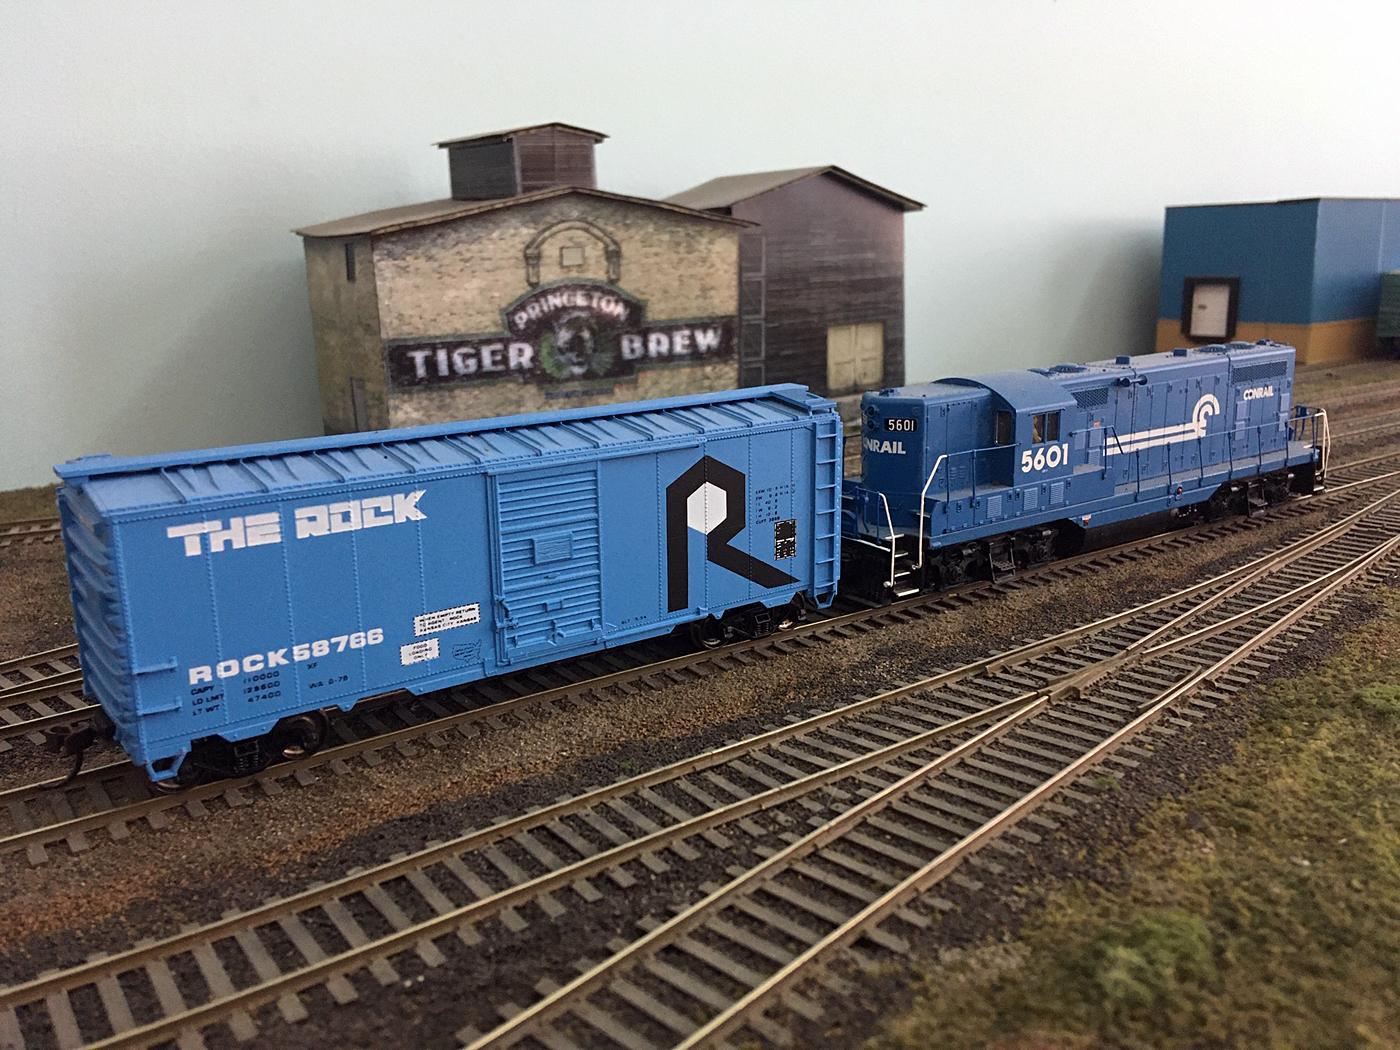 Model Rock Island boxcar